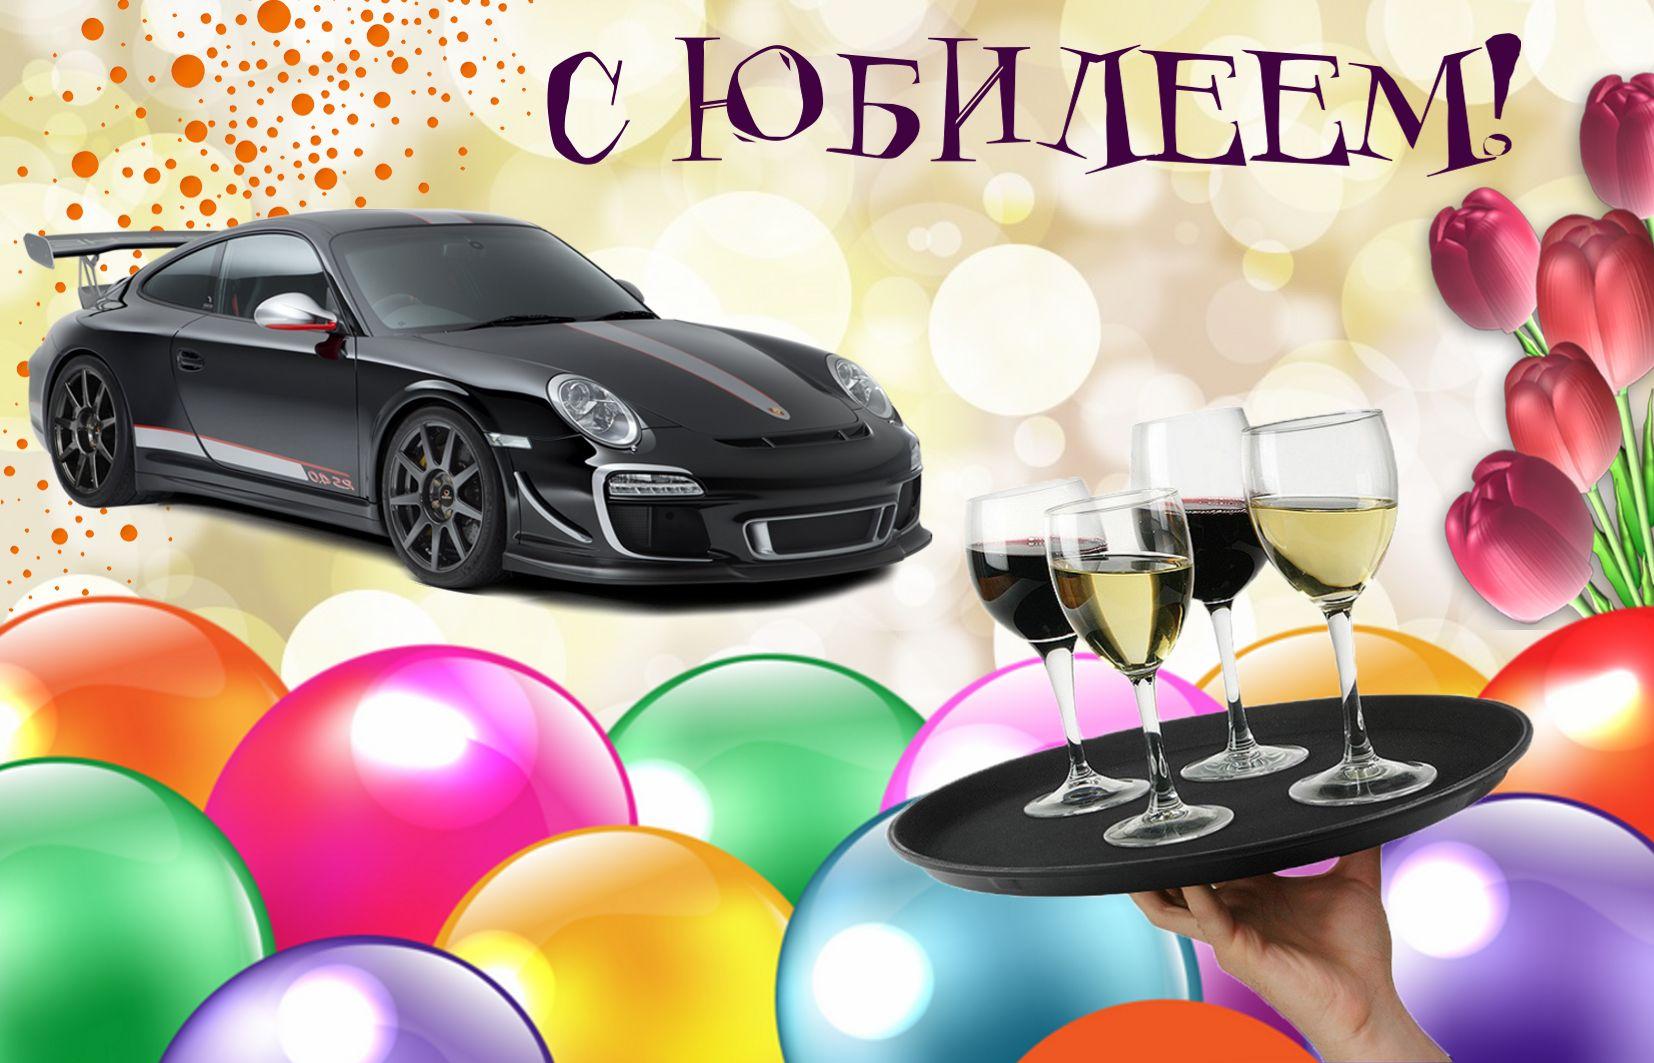 Открытка к юбилею - черная машина на праздничном фоне